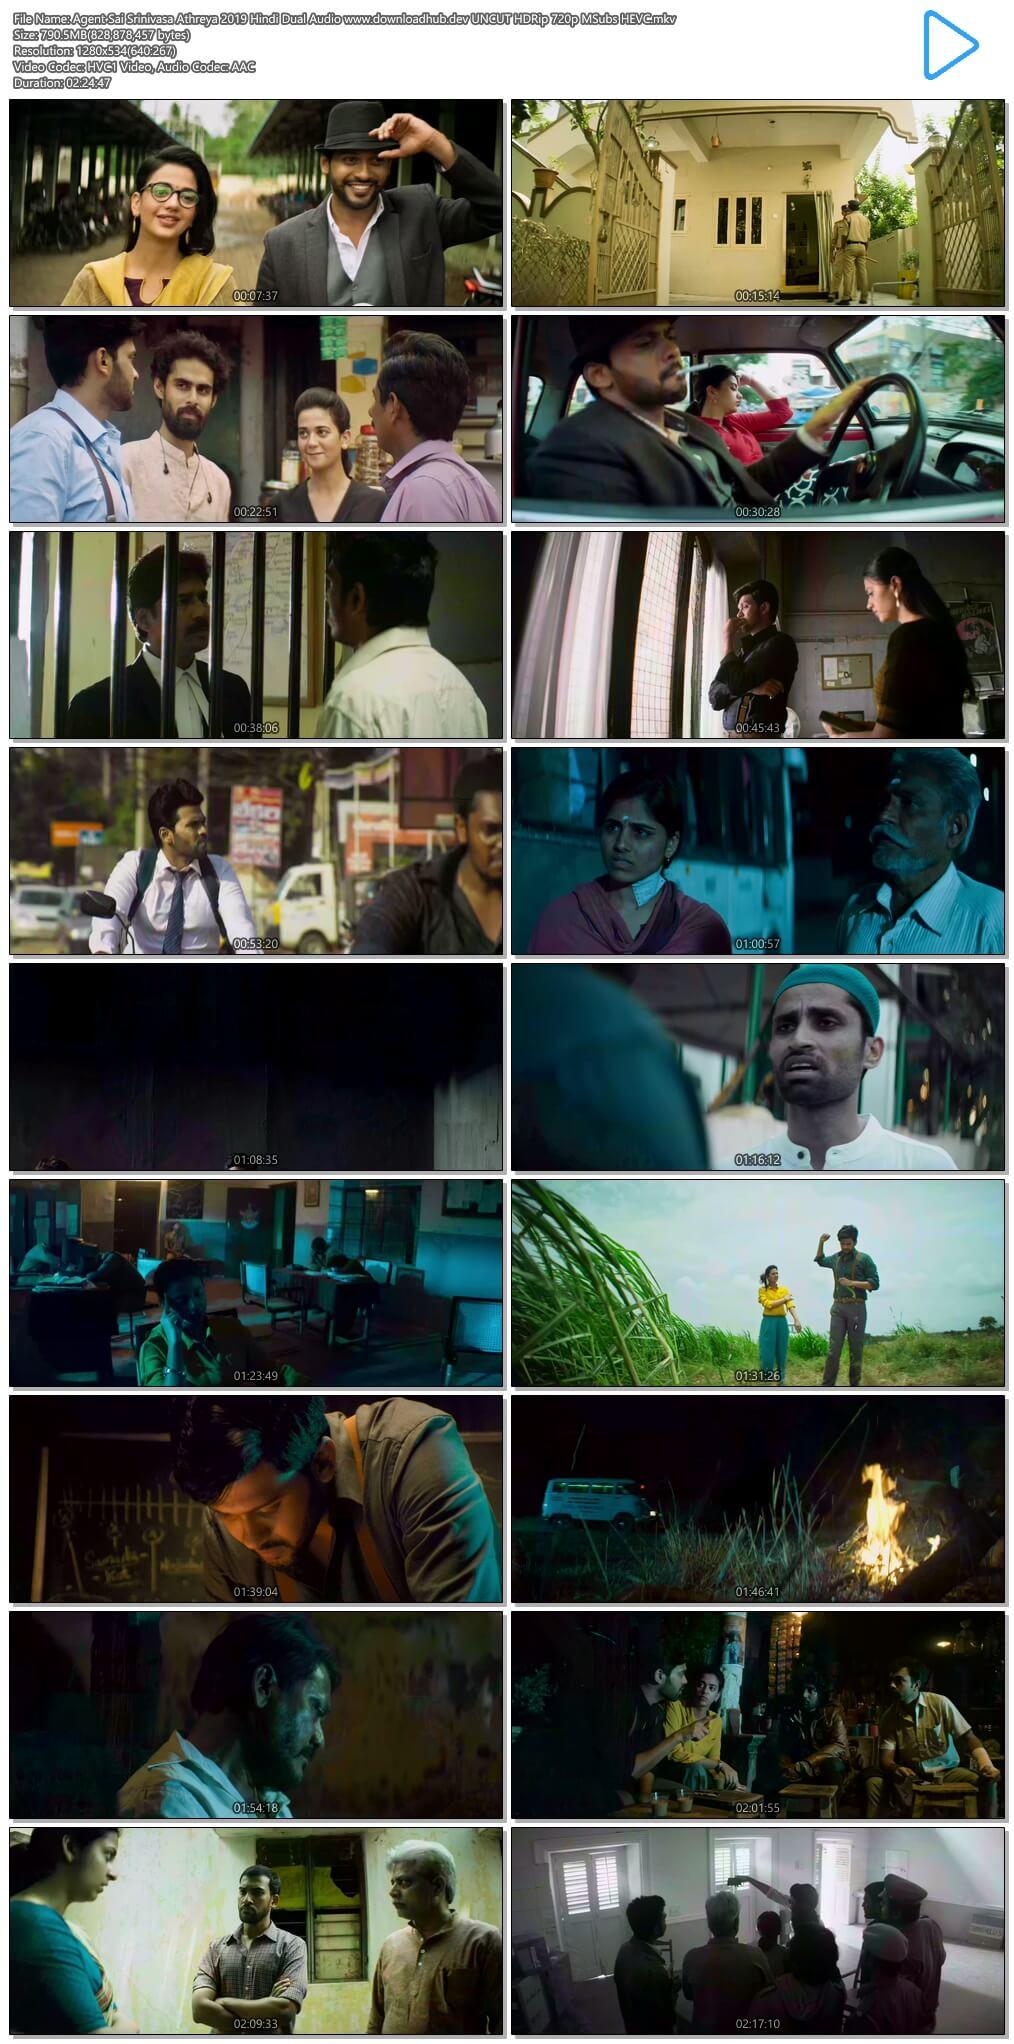 Agent Sai Srinivasa Athreya 2019 Hindi Dual Audio 750MB UNCUT HDRip 720p MSubs HEVC